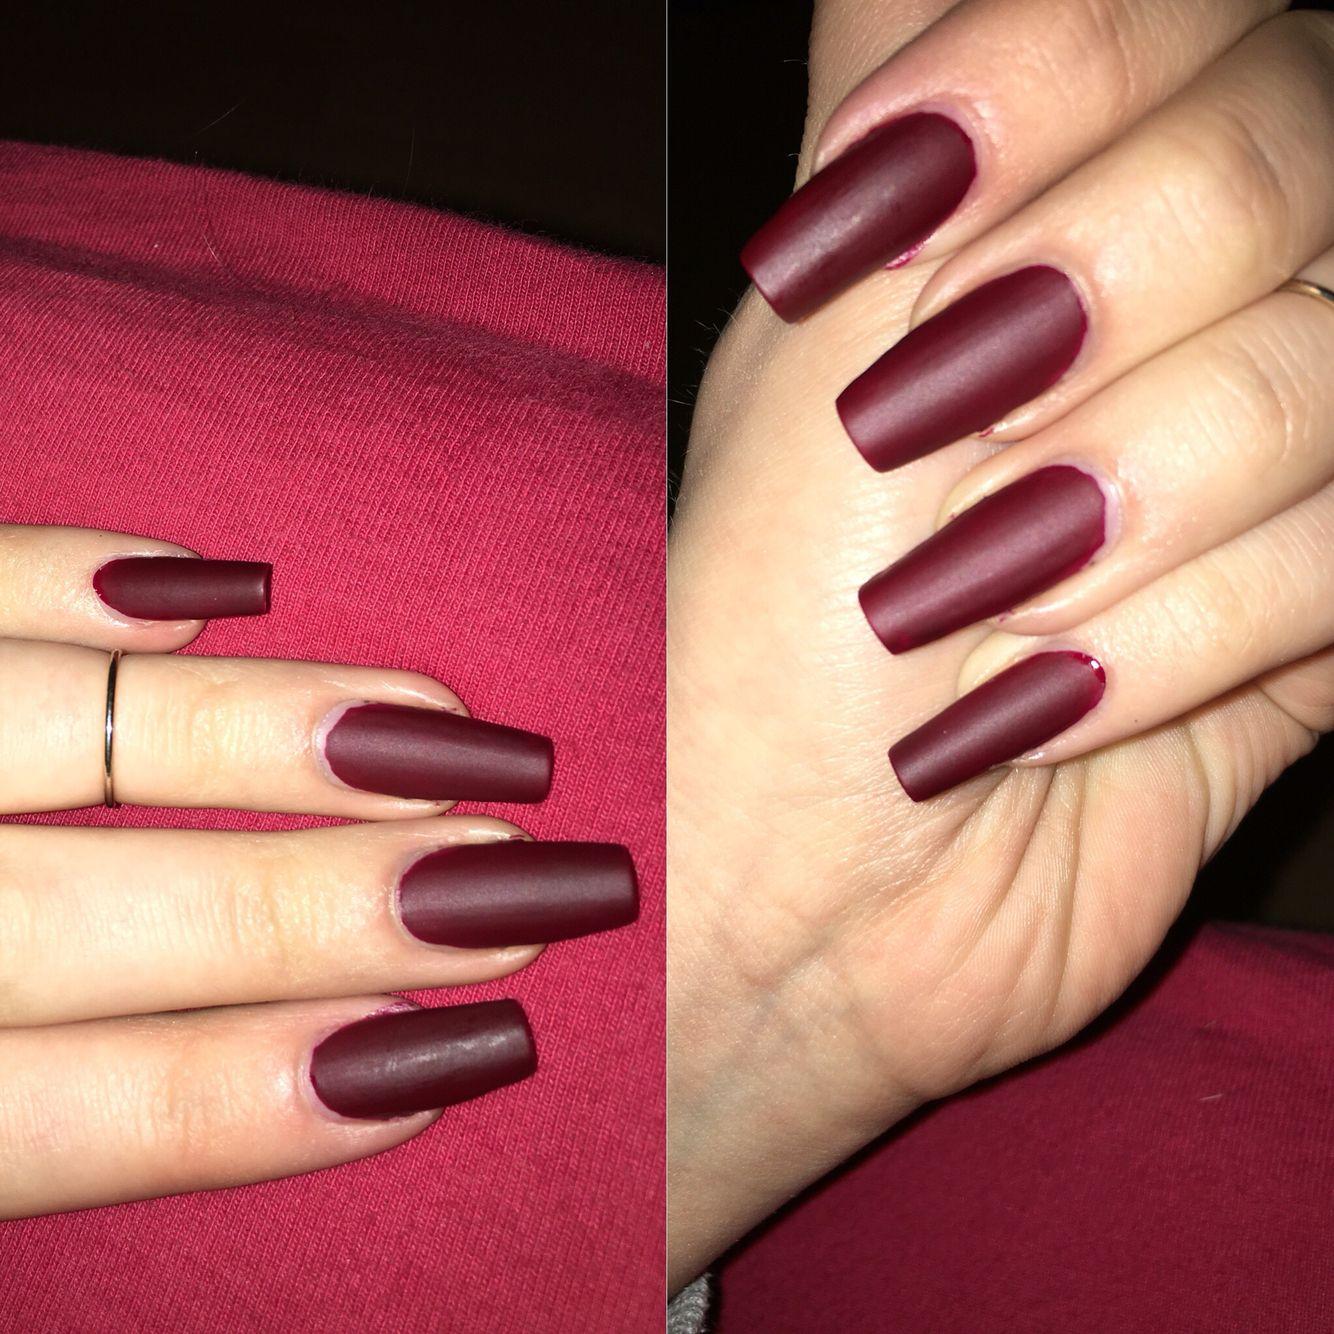 Nails red❤ Nägel dunkelrot ❤ | Nails / Nägel ✨ | Pinterest ...